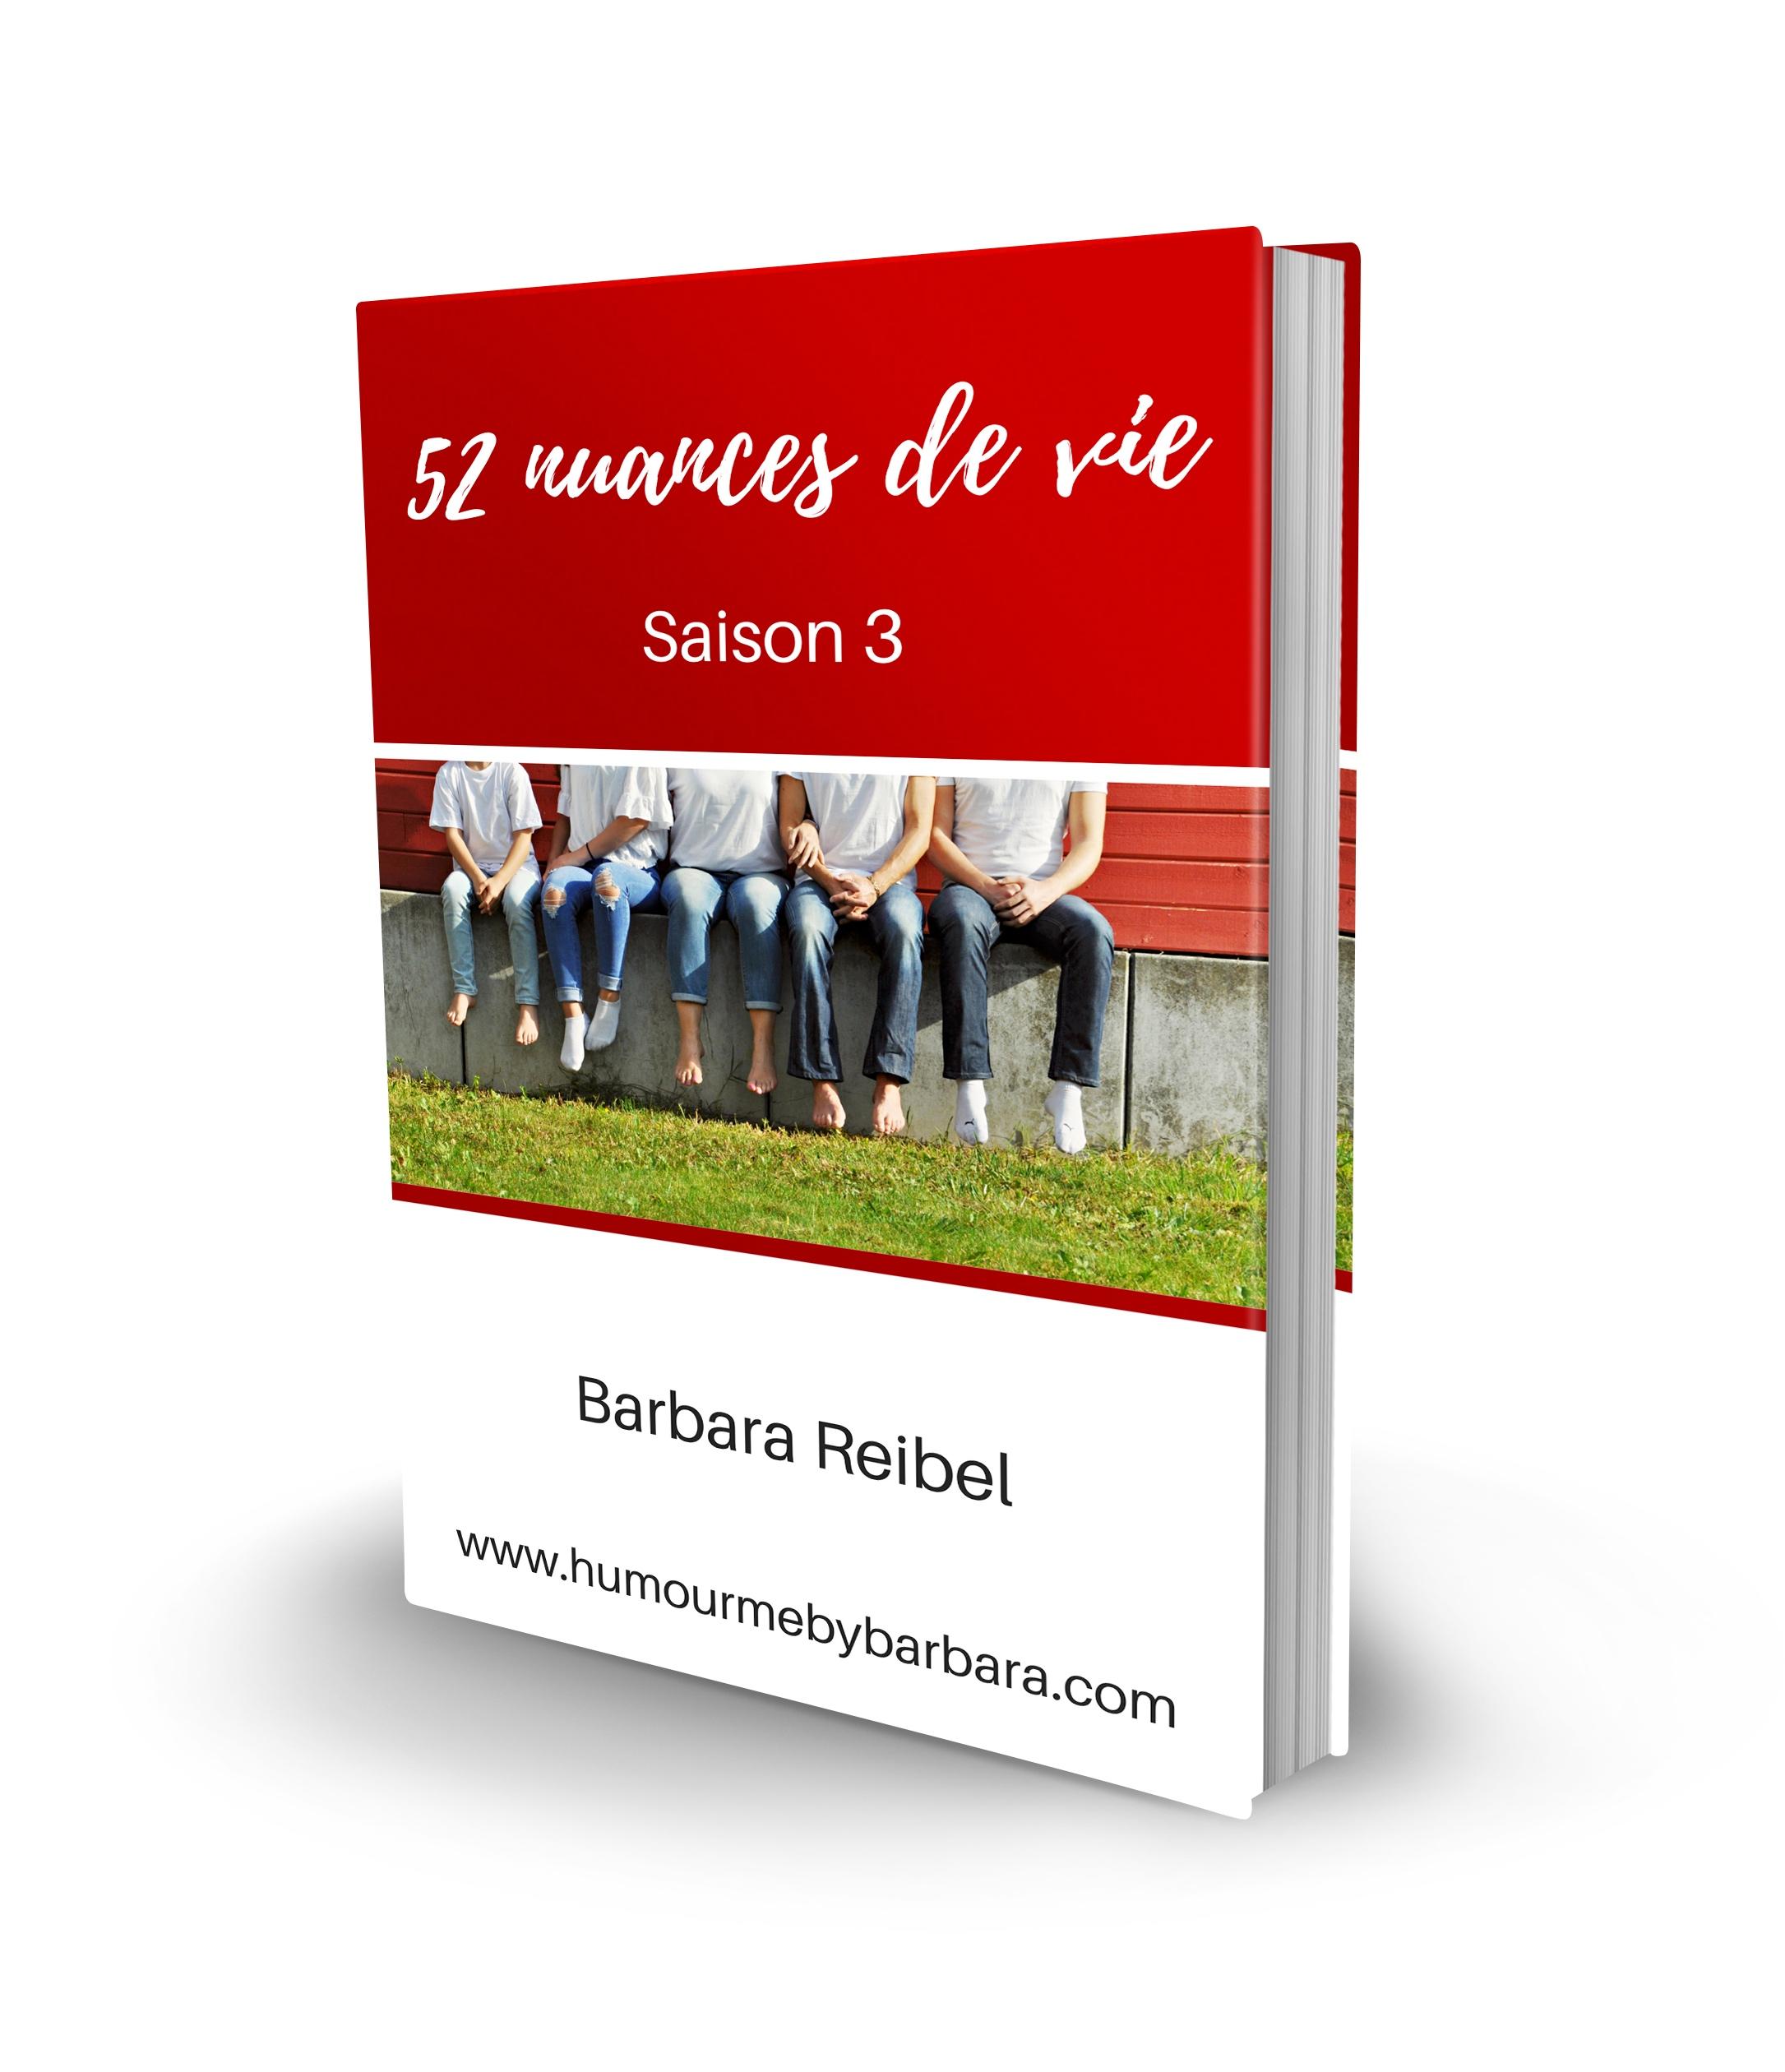 Saison 3 - 52 nuances de vie Barbara Reibel